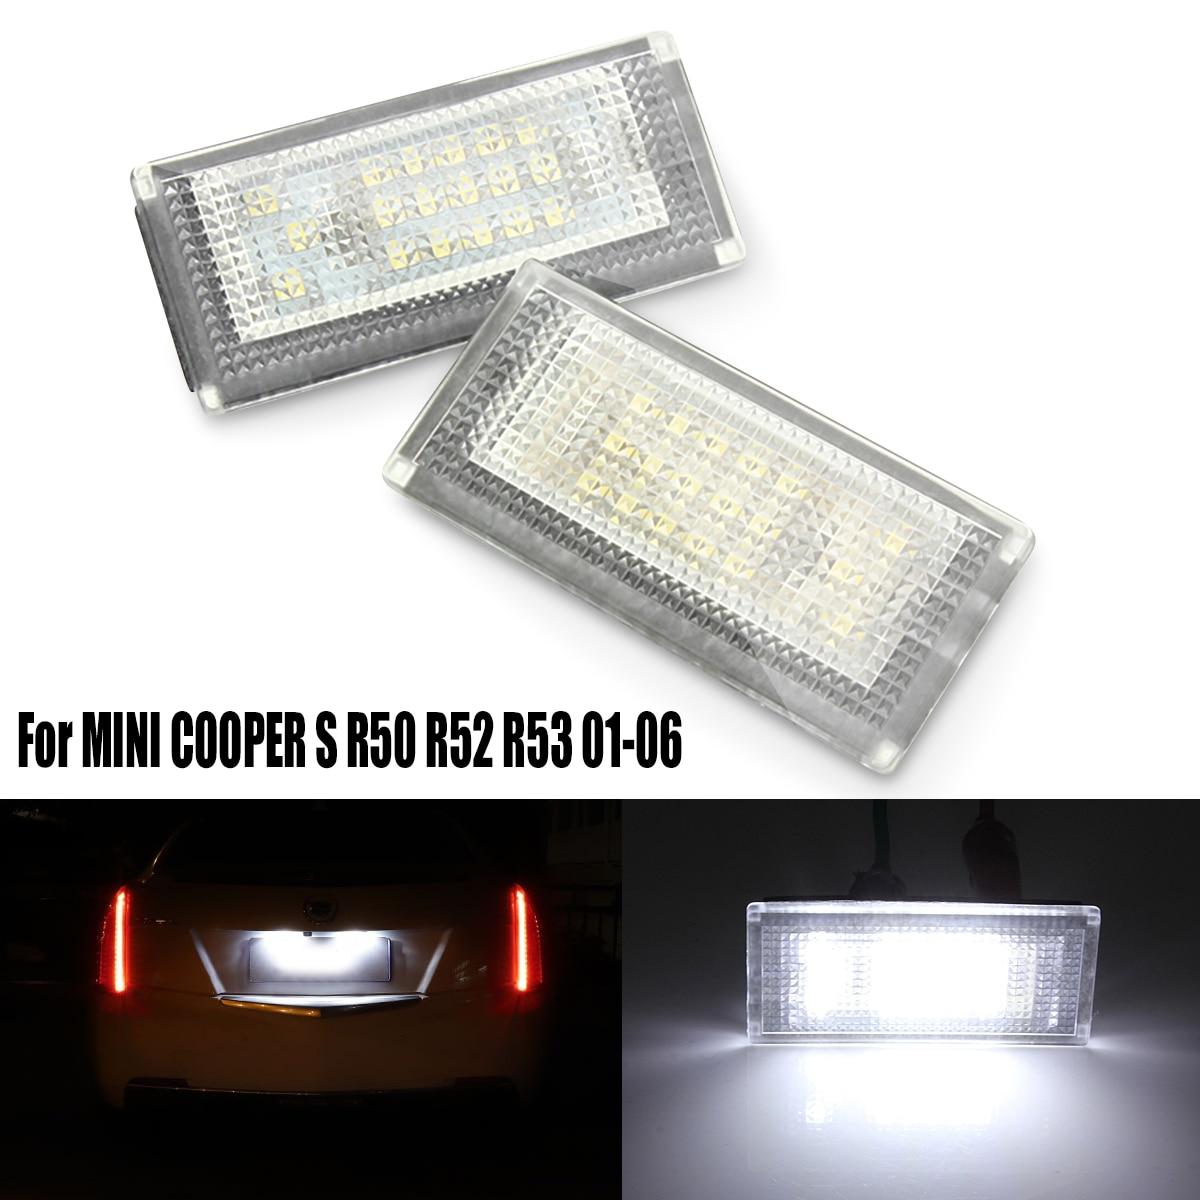 2 PCS Car LED Number License Plate Lights 6000K Plate Light Bulb For BMW//MINI COOPER S R50 R53 Accessories